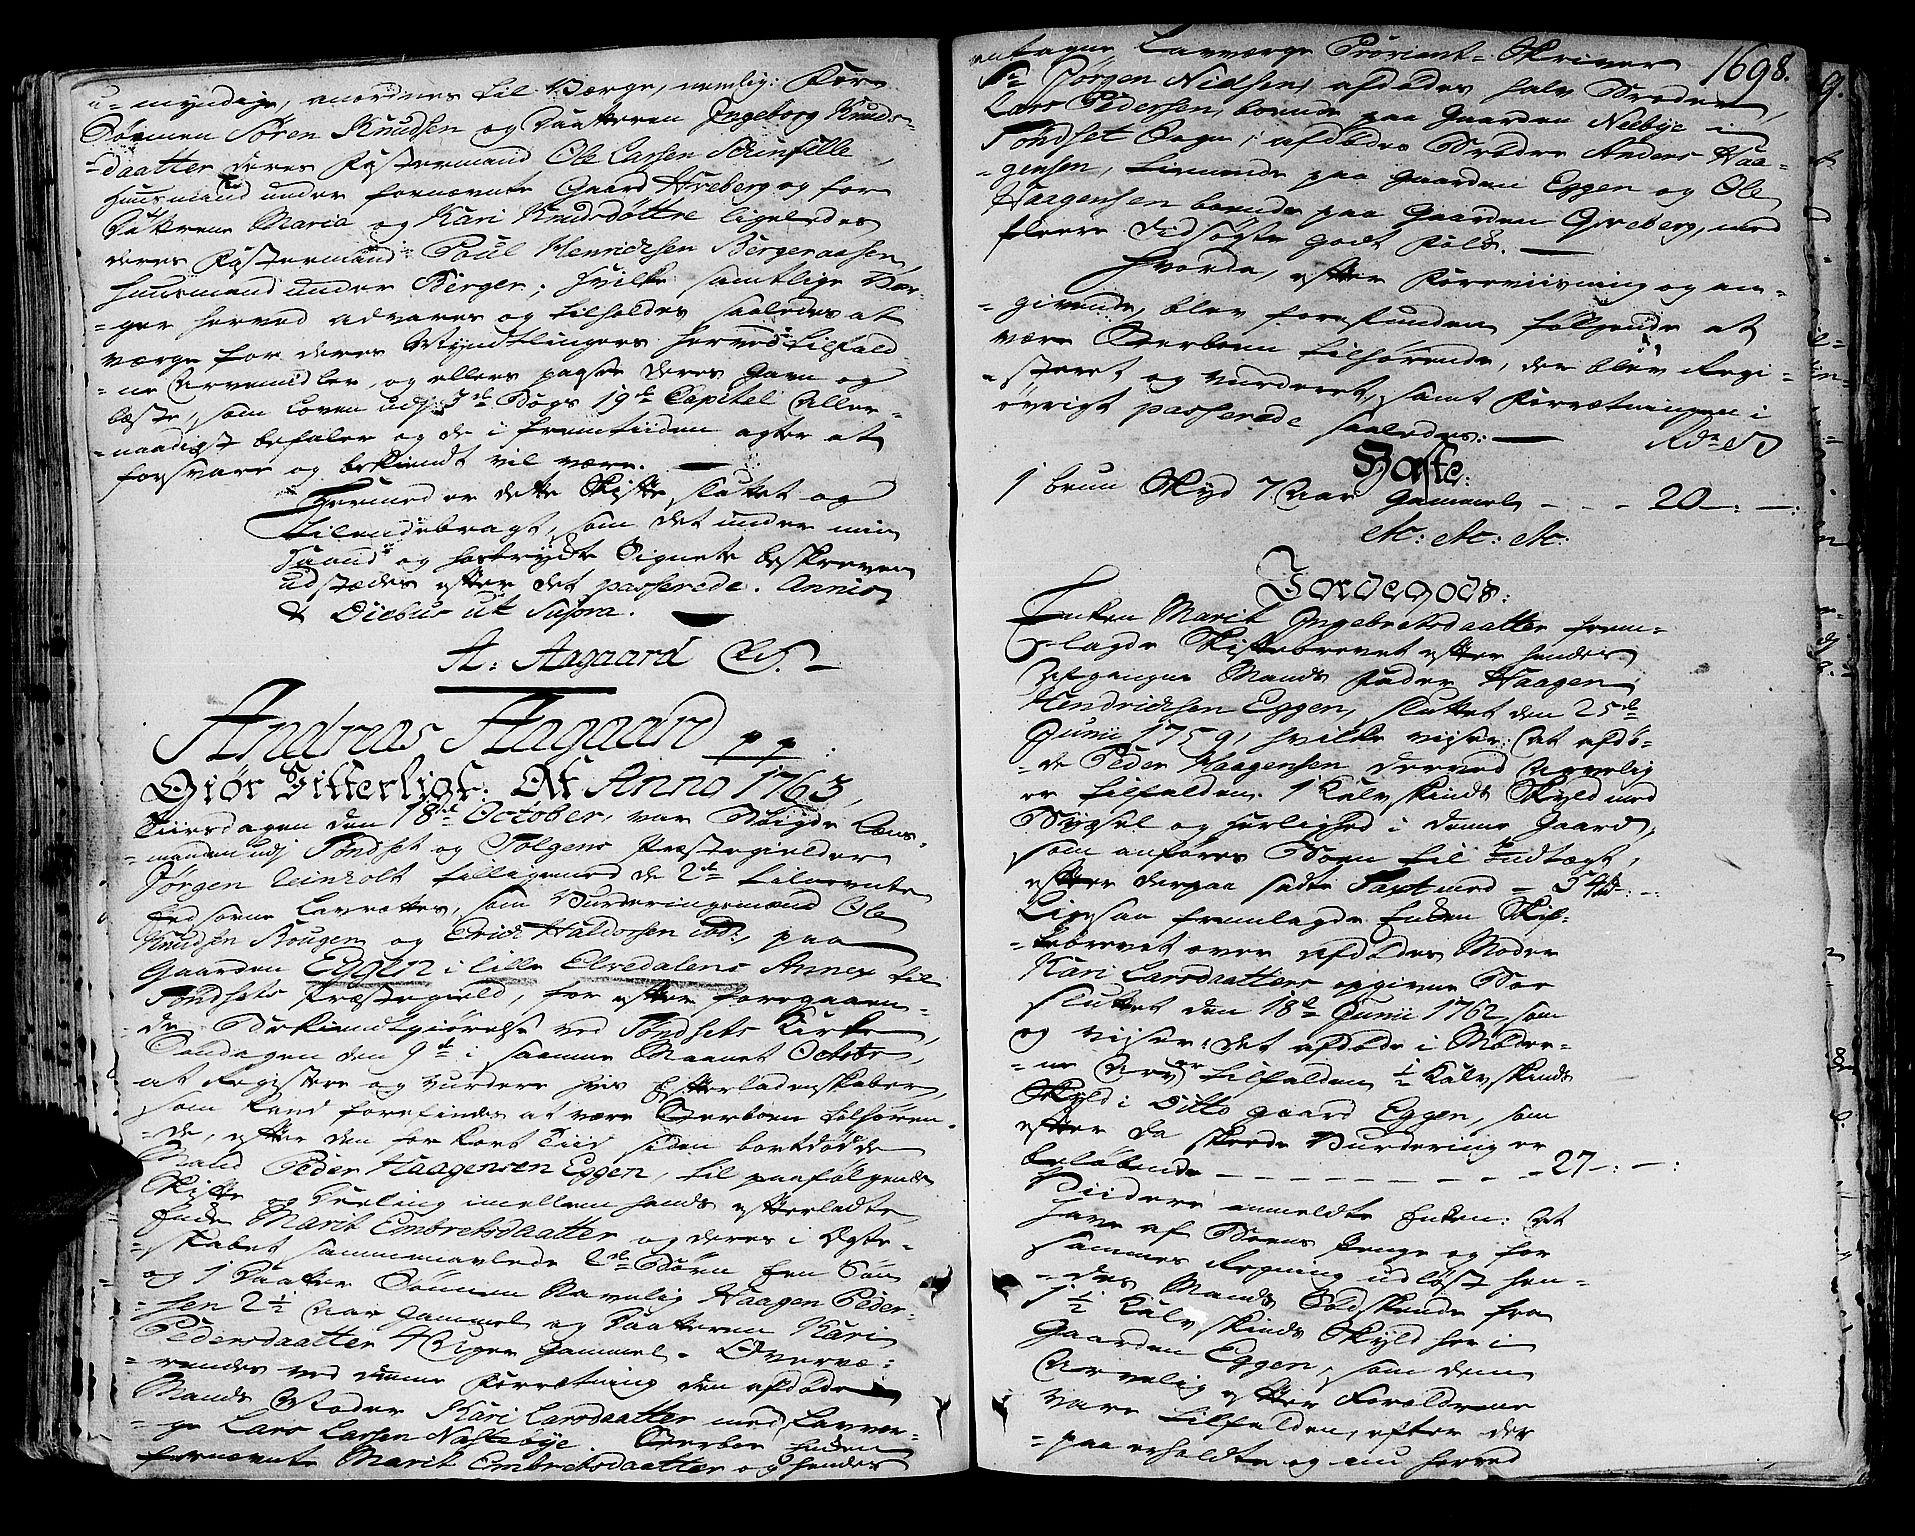 SAH, Solør og Østerdalen sorenskriveri, J/Ja/L0012A: Skifteprotokoll, 1757-1764, s. 1697b-1698a